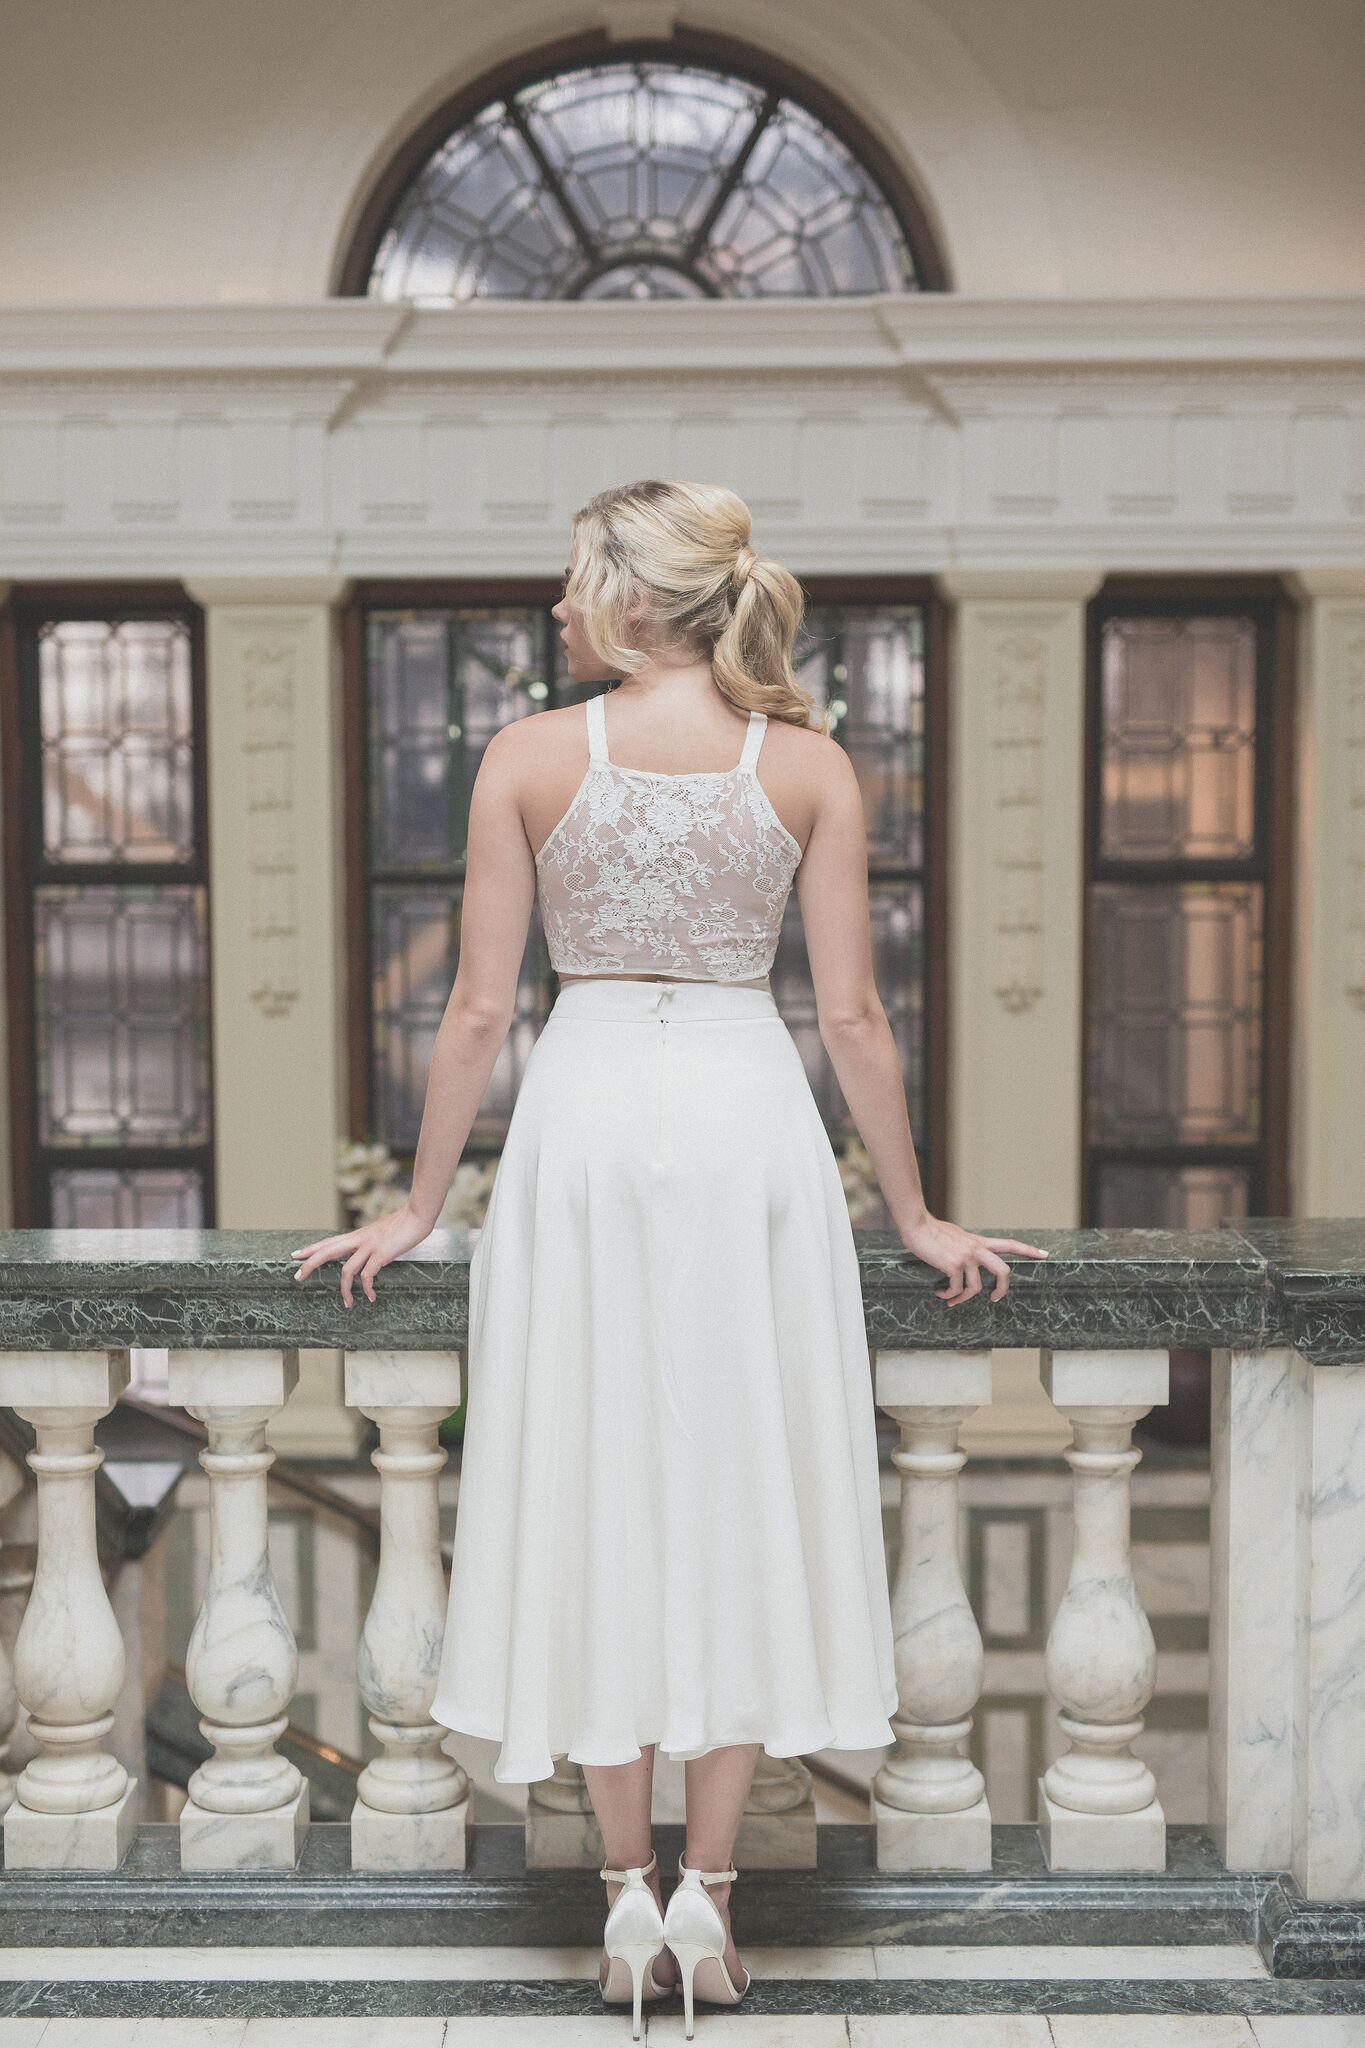 Thomas Skirt | Registry office wedding, Bridal separates and ...